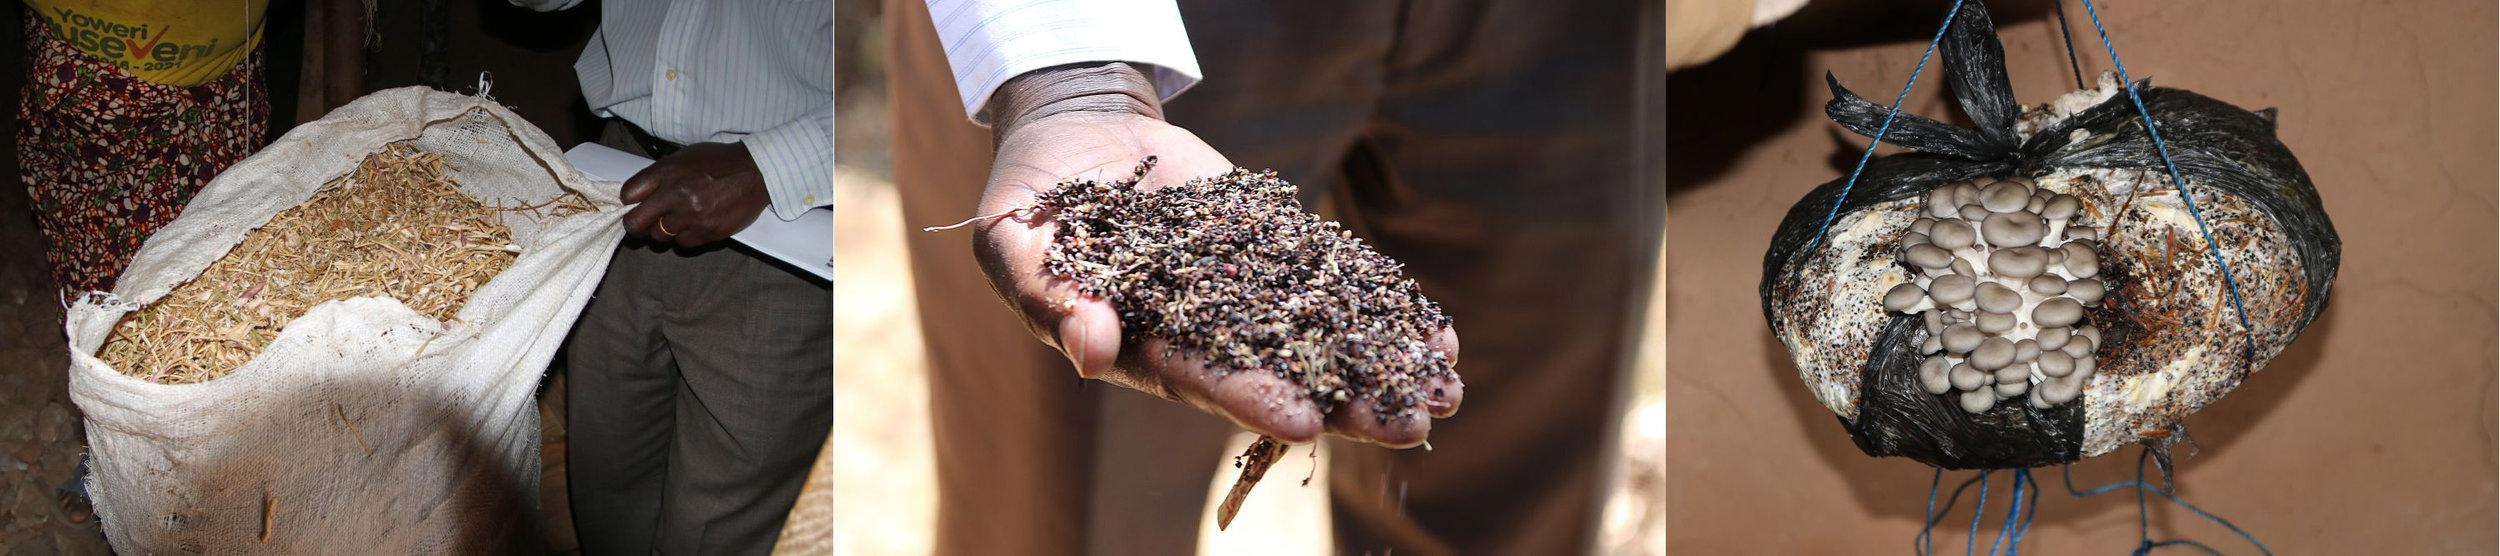 Bean straw and sorghum husks for growing medium; oyster mushroom growing bag